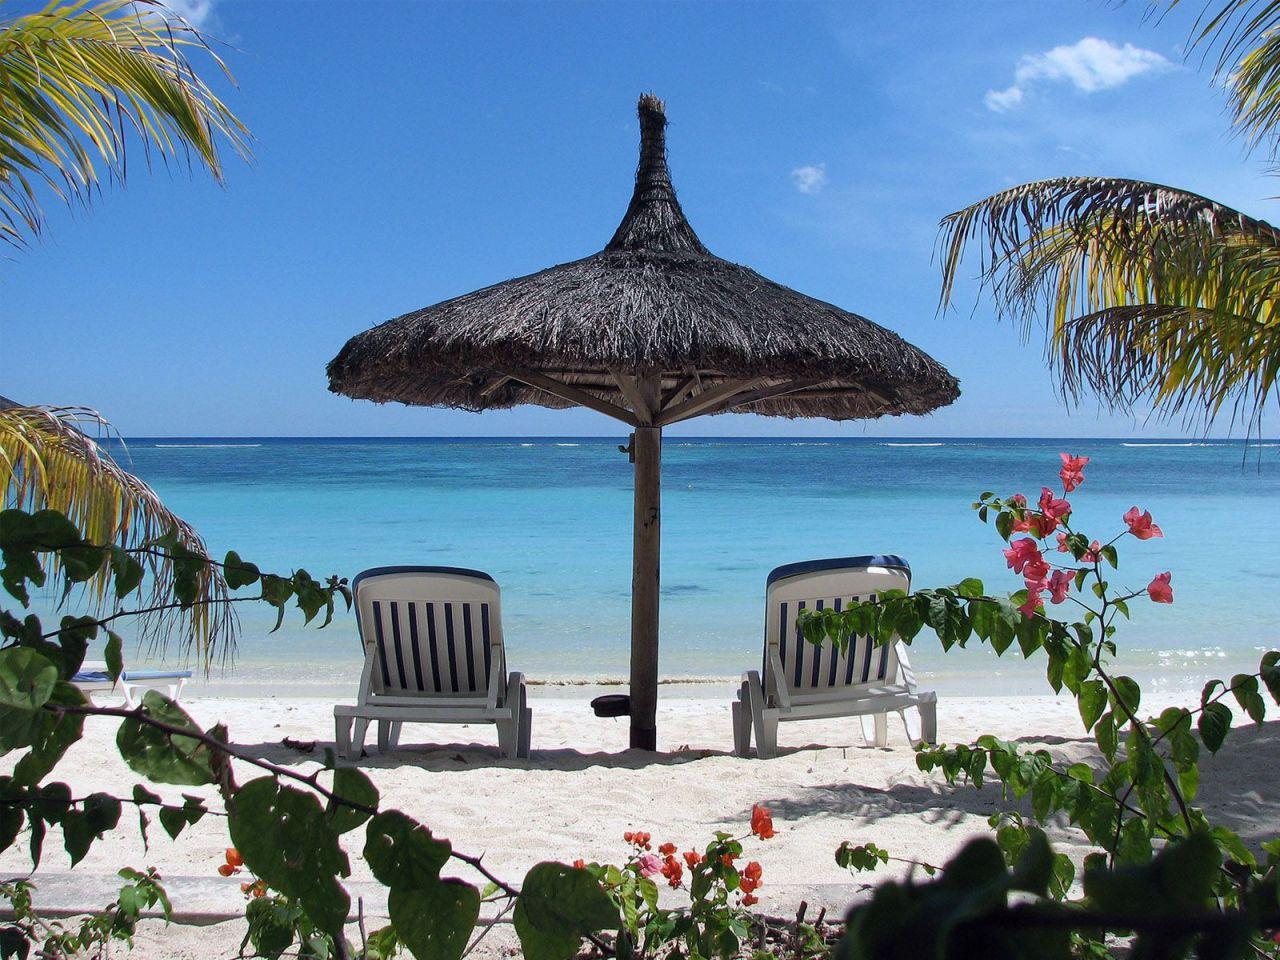 http://1.bp.blogspot.com/-L2tOAQjH6Rw/TXpqEOw4K3I/AAAAAAAADJU/iFb3zBdfGhI/s1600/mauritius_island.jpg